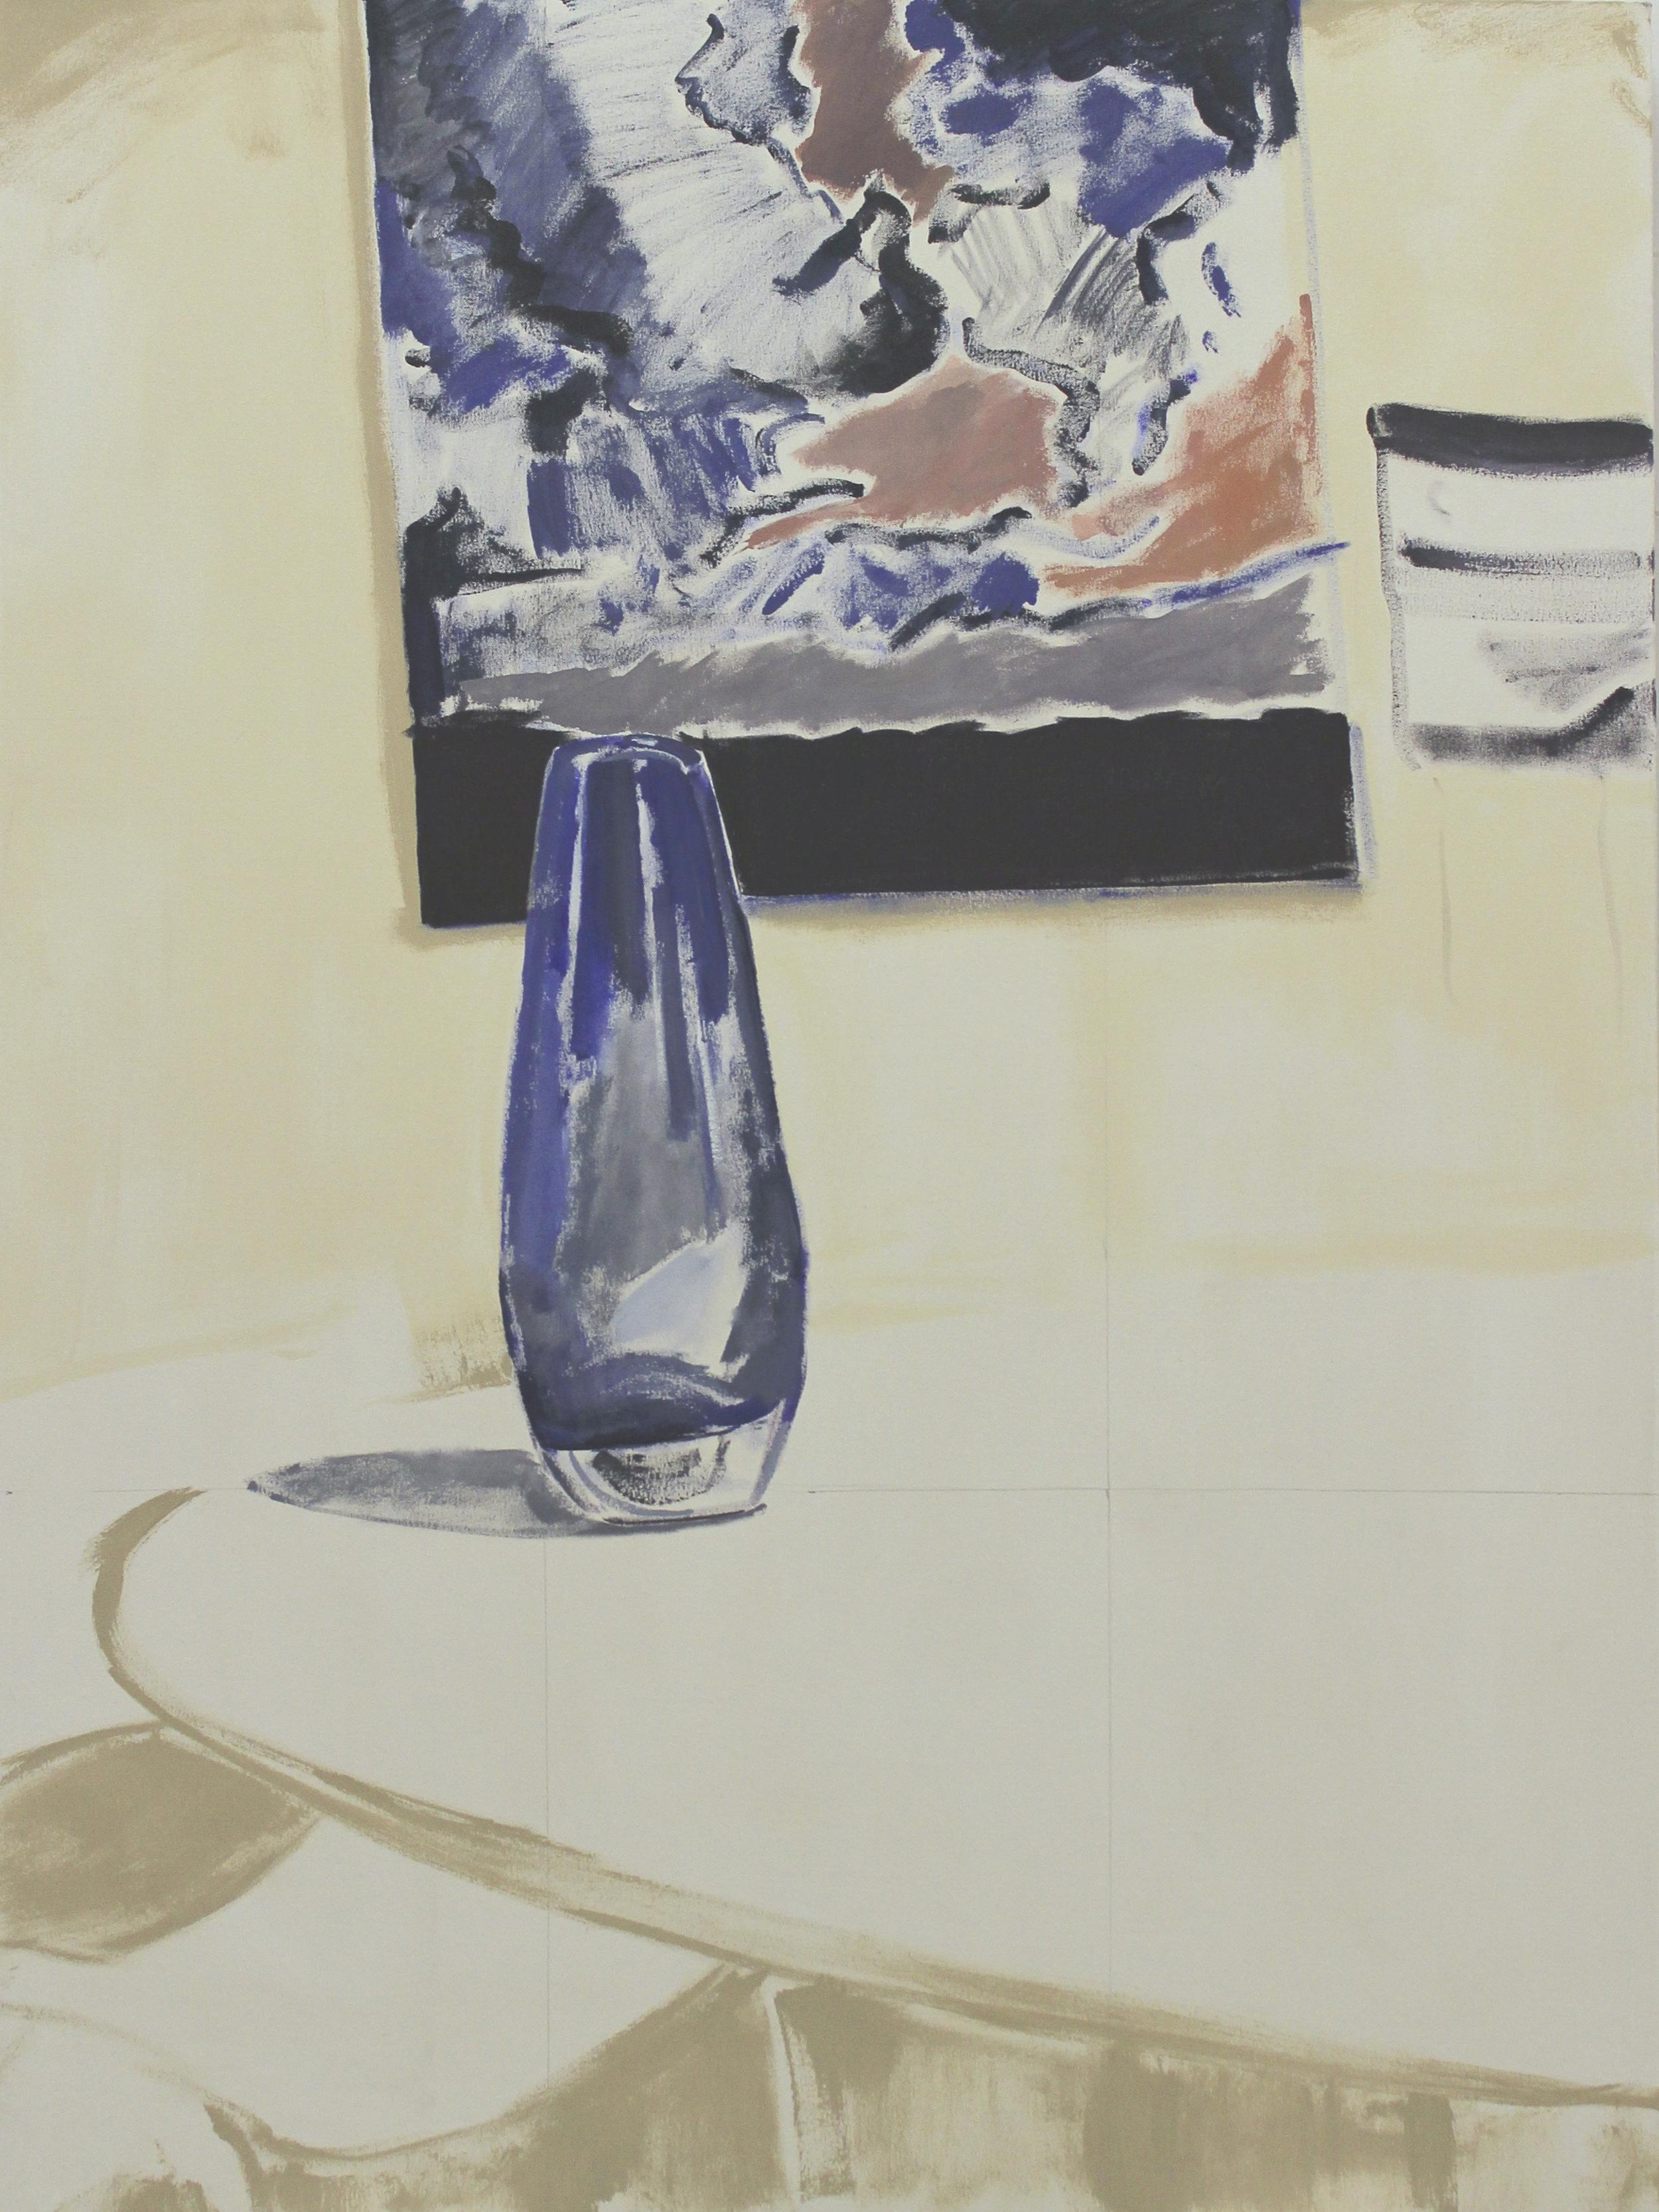 "Three Artists, 55"" x 41"", acrylic on canvas, 2016"